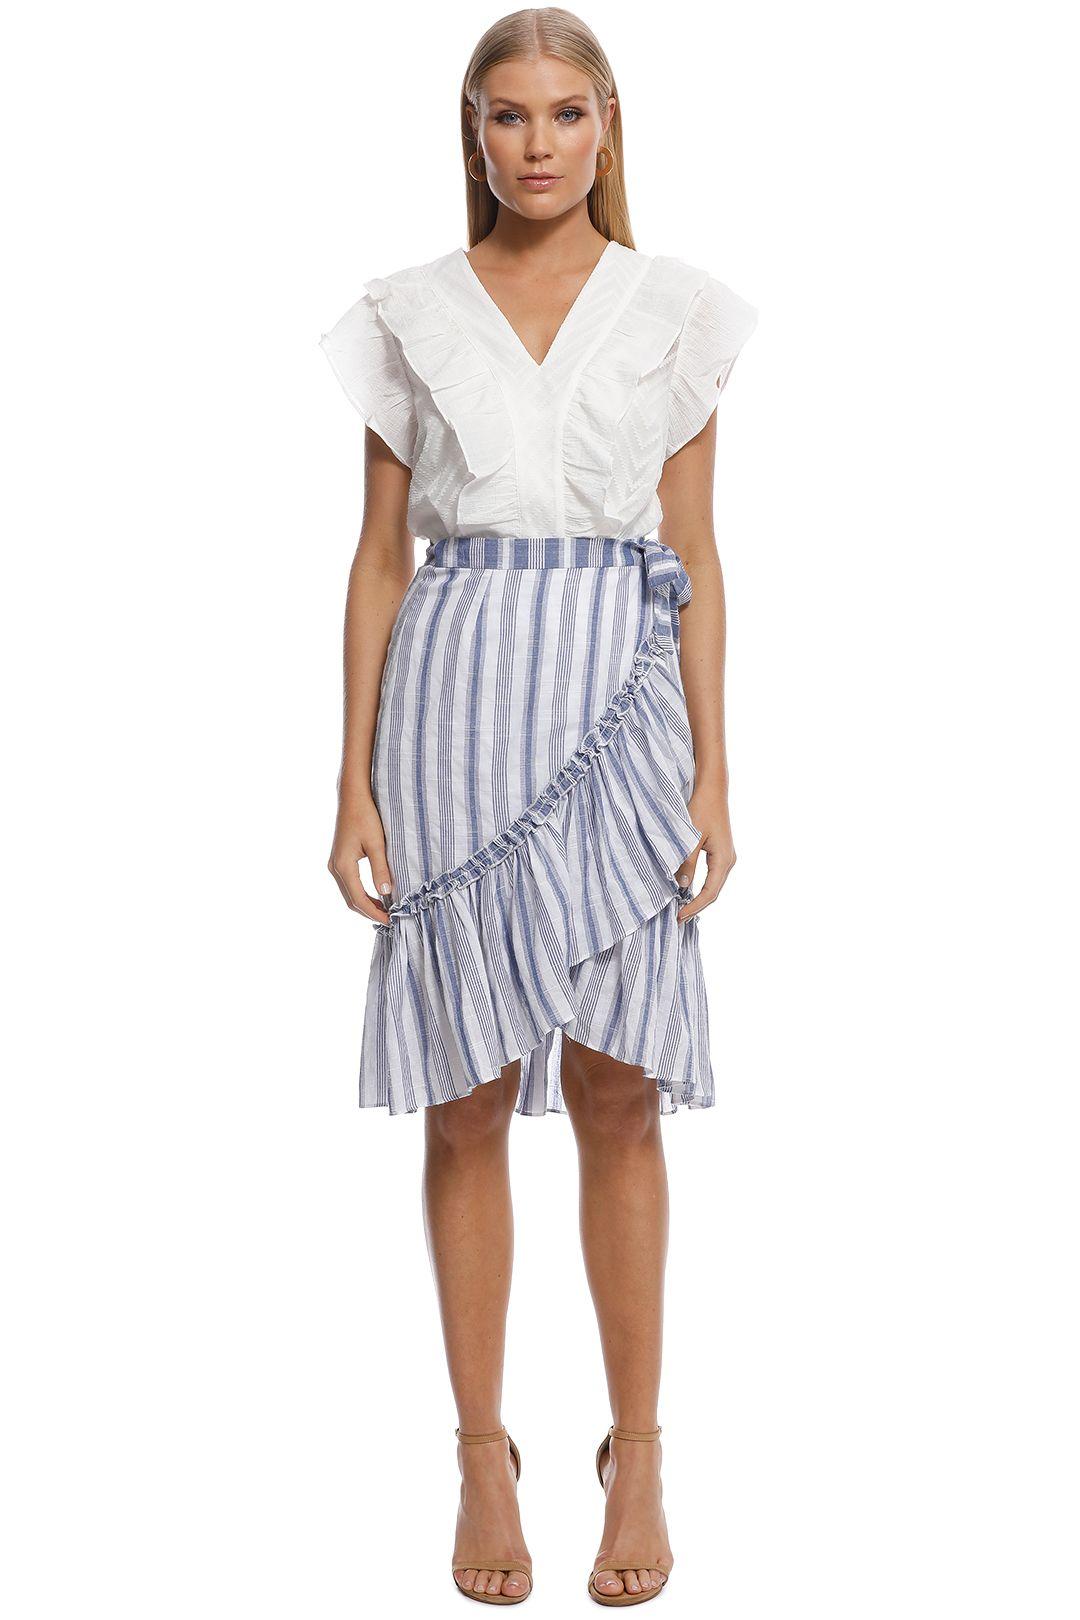 Suboo - Wrap Midi Skirt - Blue White Stripes - Front